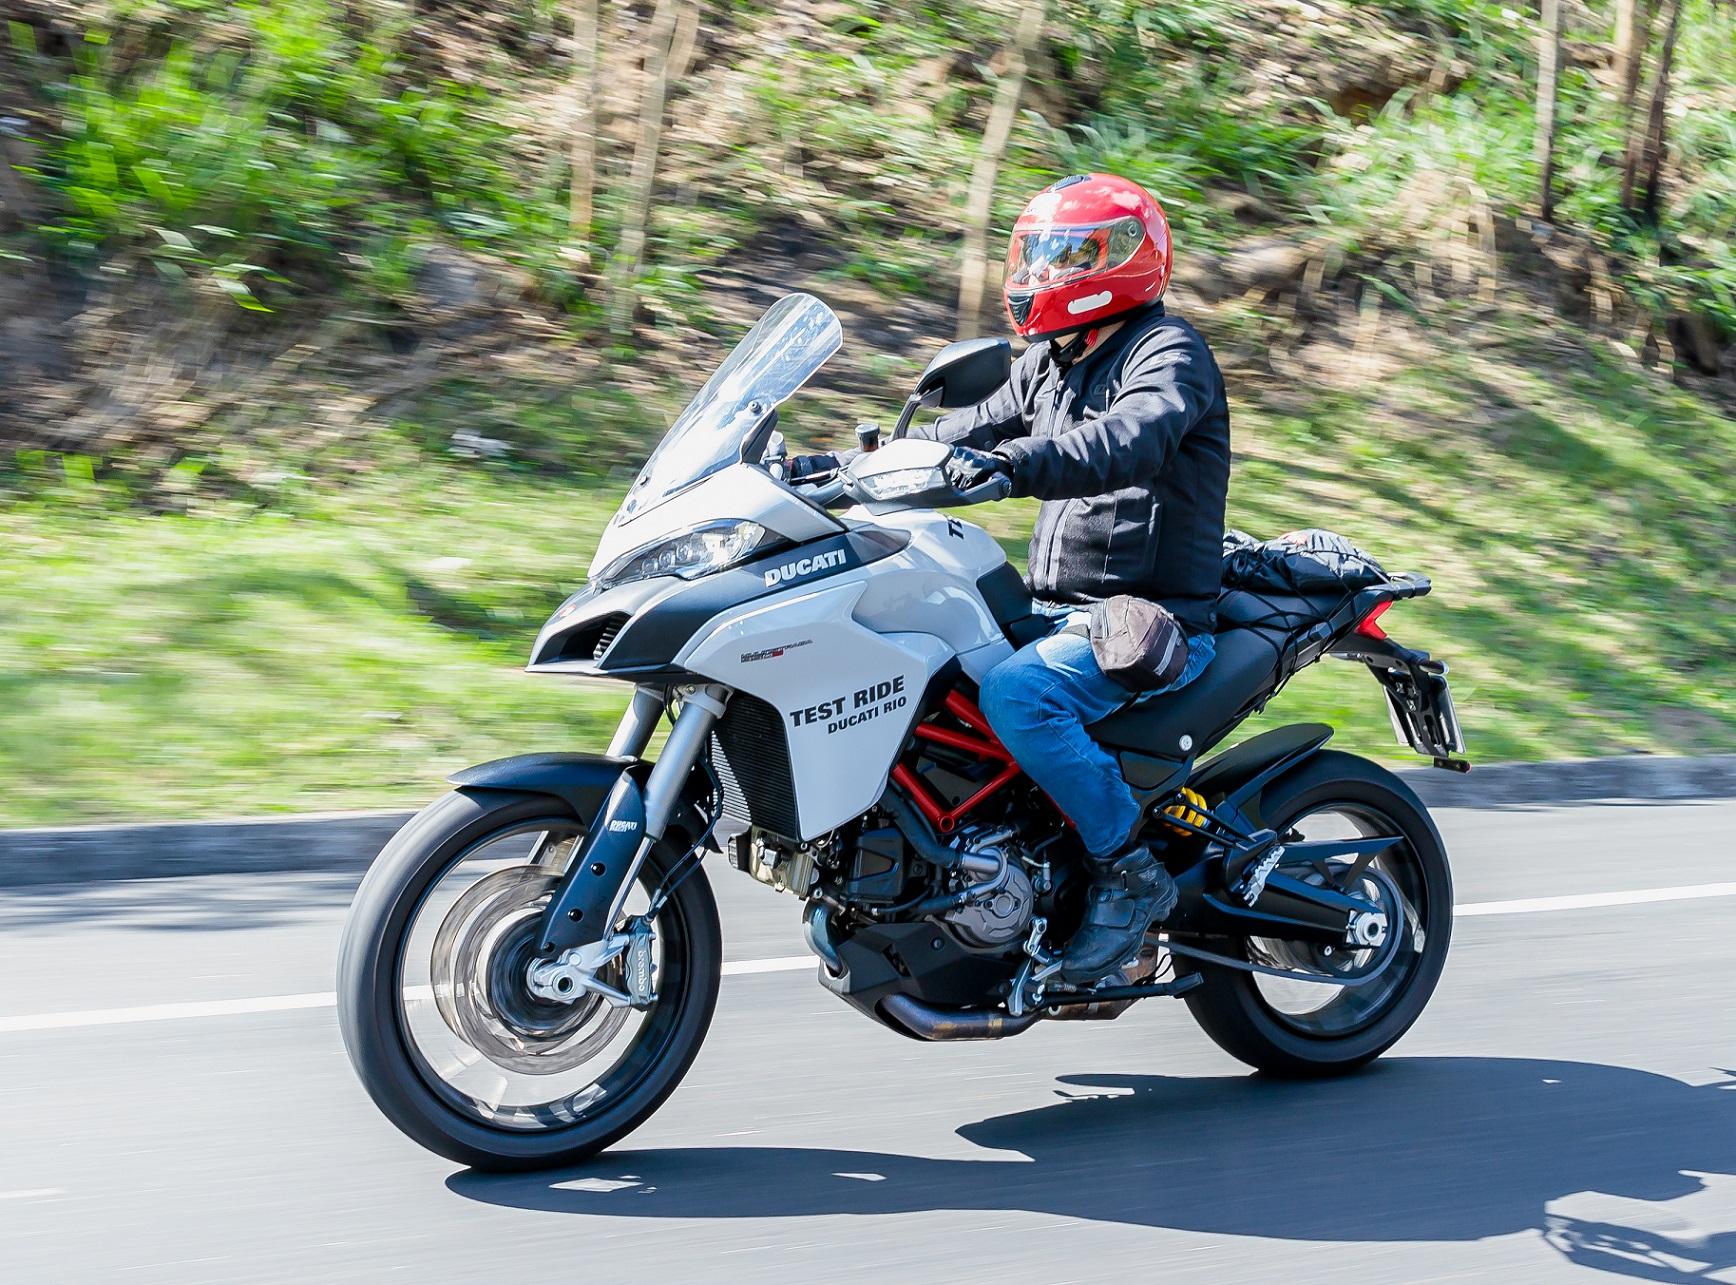 Ducati Multistrada 1